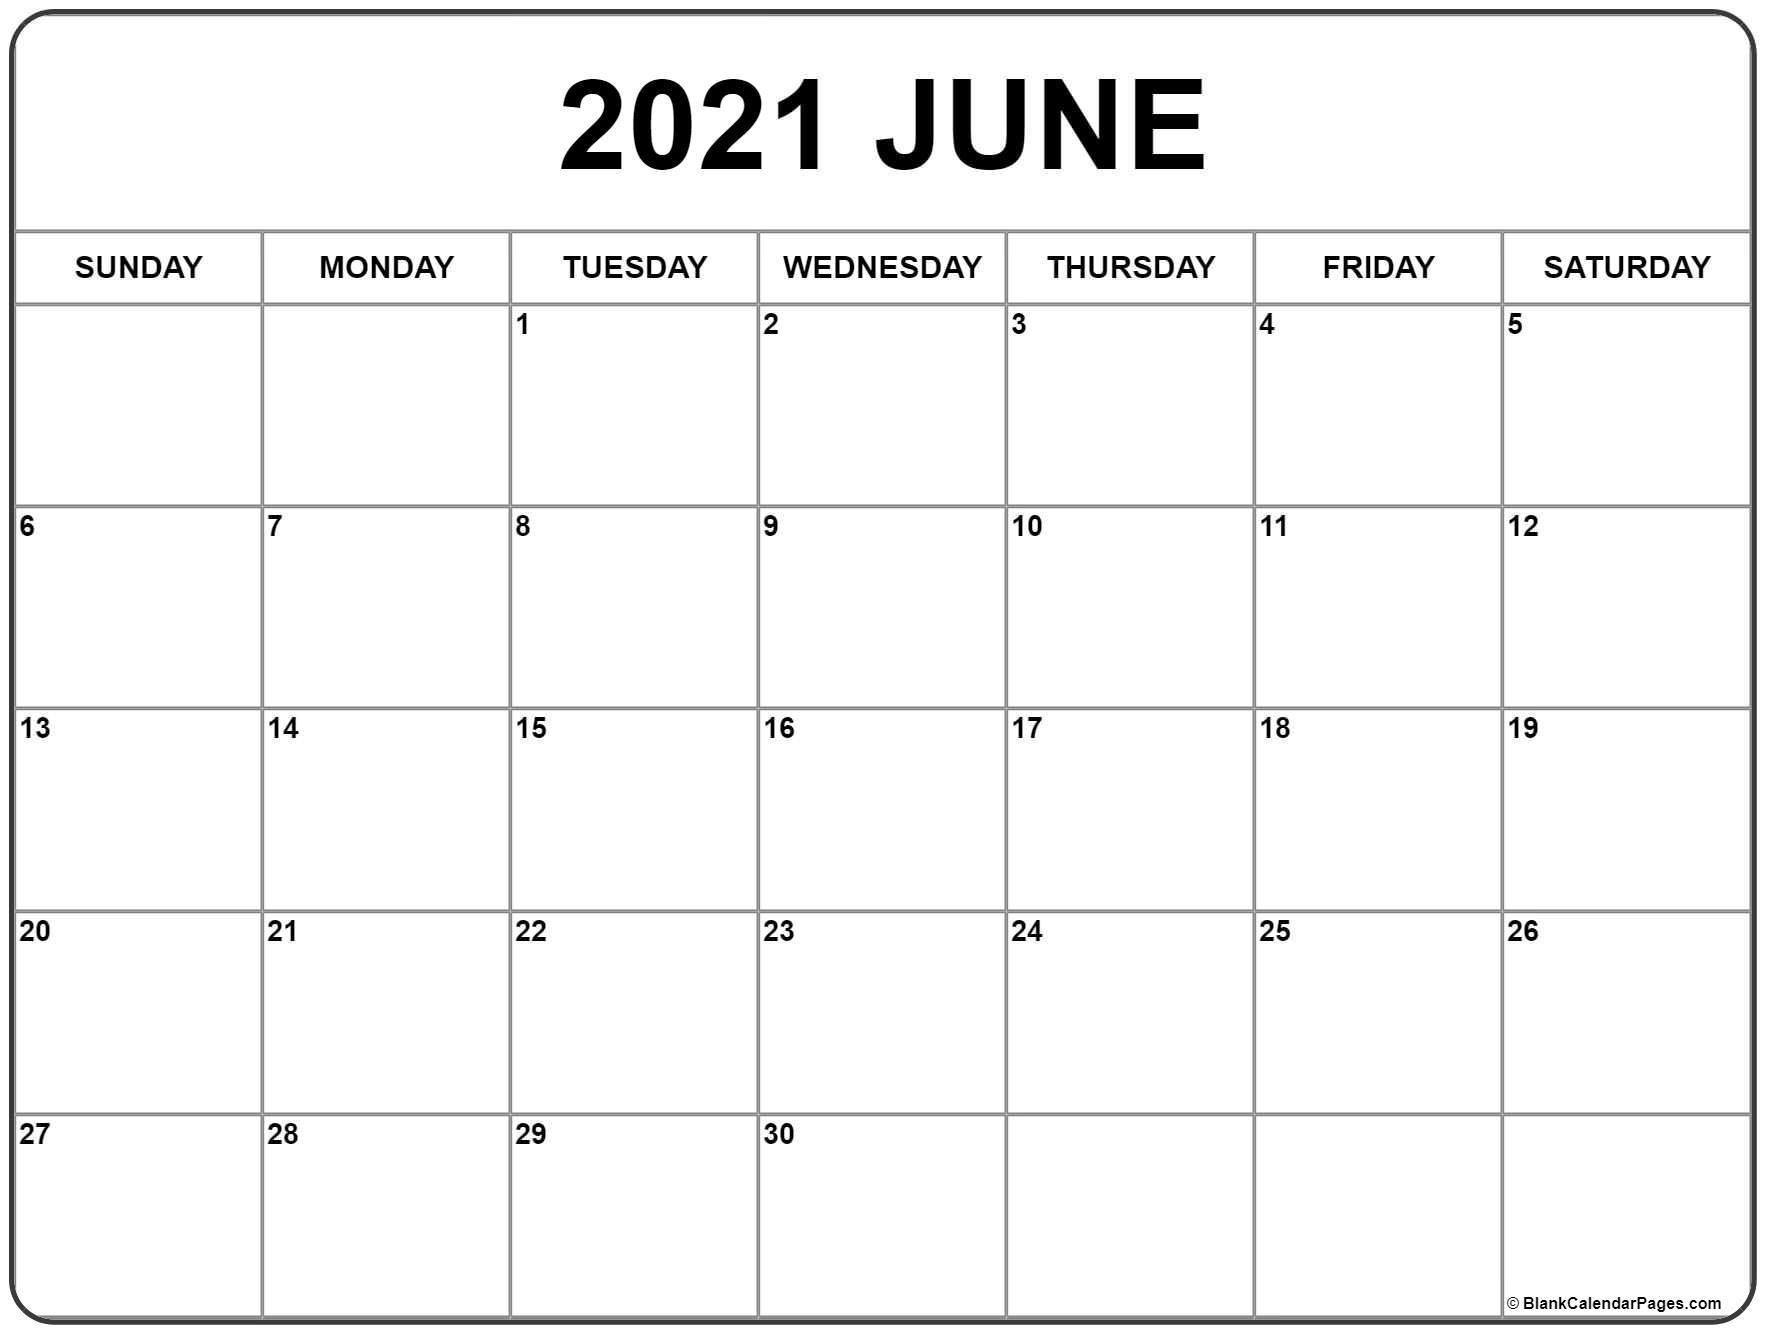 June 2021 Calendar   Free Printable Monthly Calendars-Free Printable Blank Monthly Calendar Year 2021